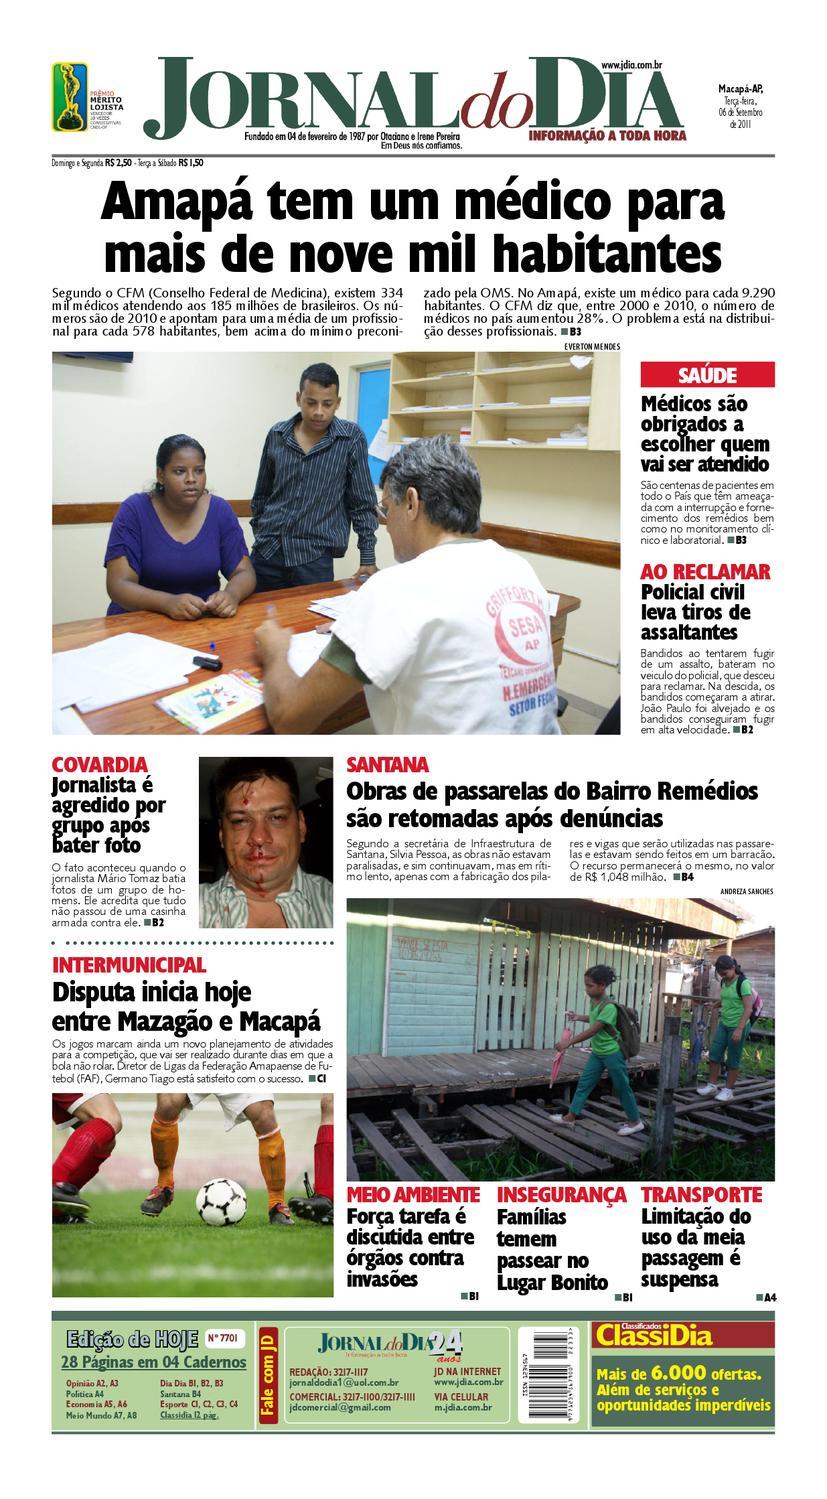 ef9fc914758 Jornal do Dia 06 09 2011 by Jornal Do Dia - issuu